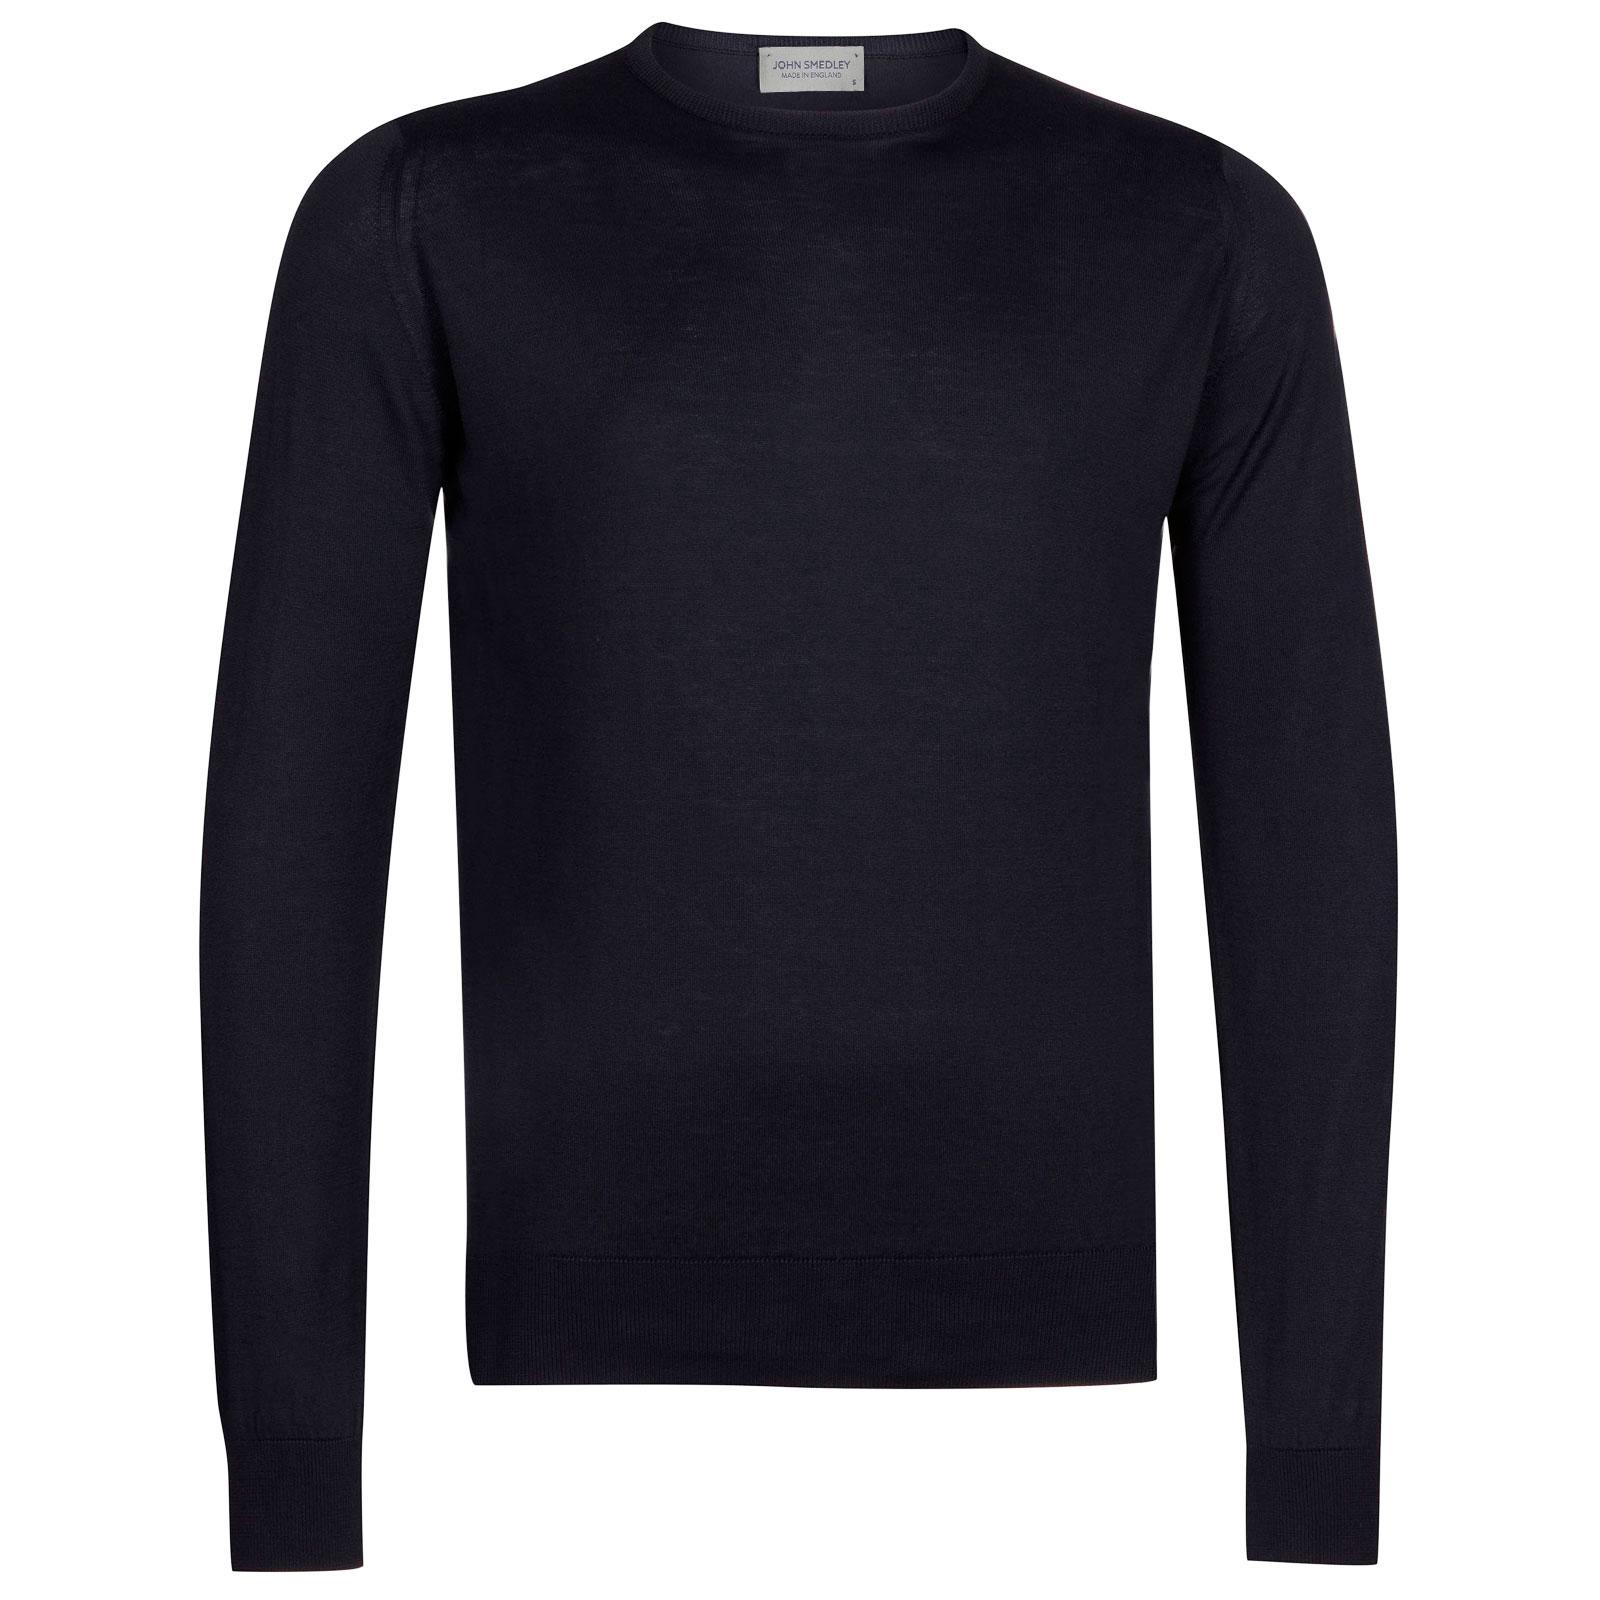 John Smedley hatfield Sea Island Cotton Pullover in Navy-XL